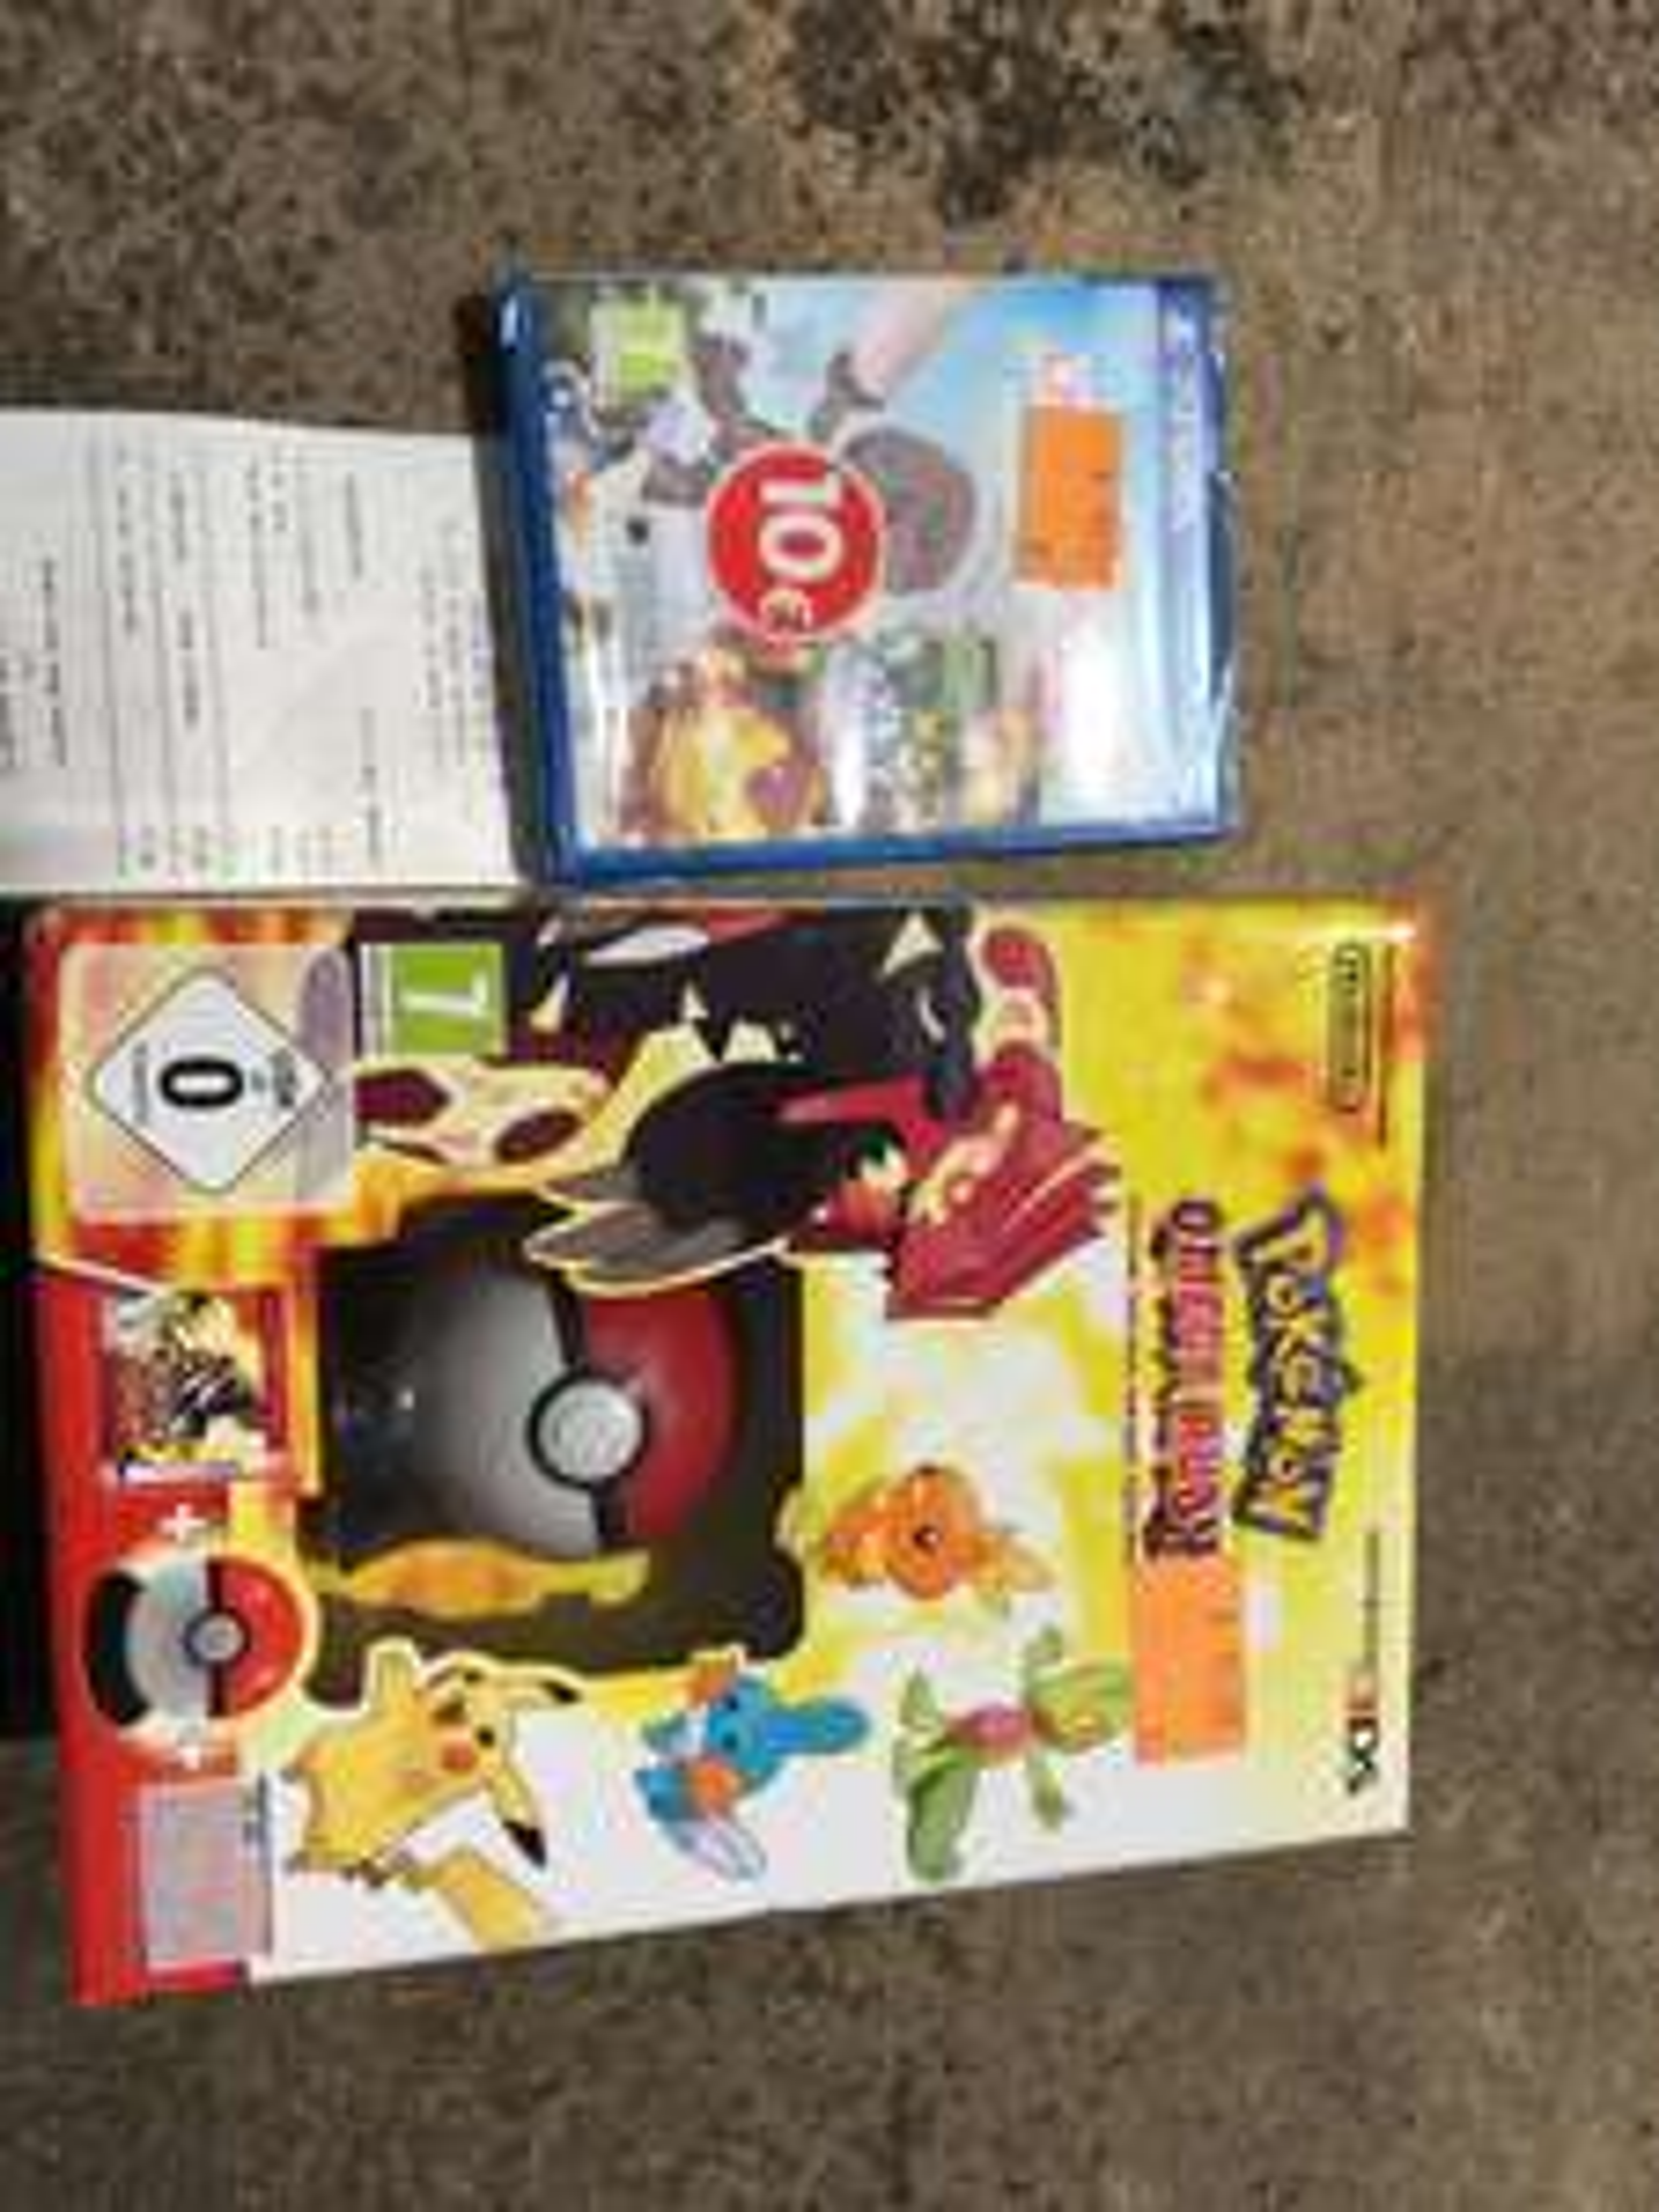 Pokemon Rubis Omega Edition limitée (avec Pokeball + Poster) sur 3DS